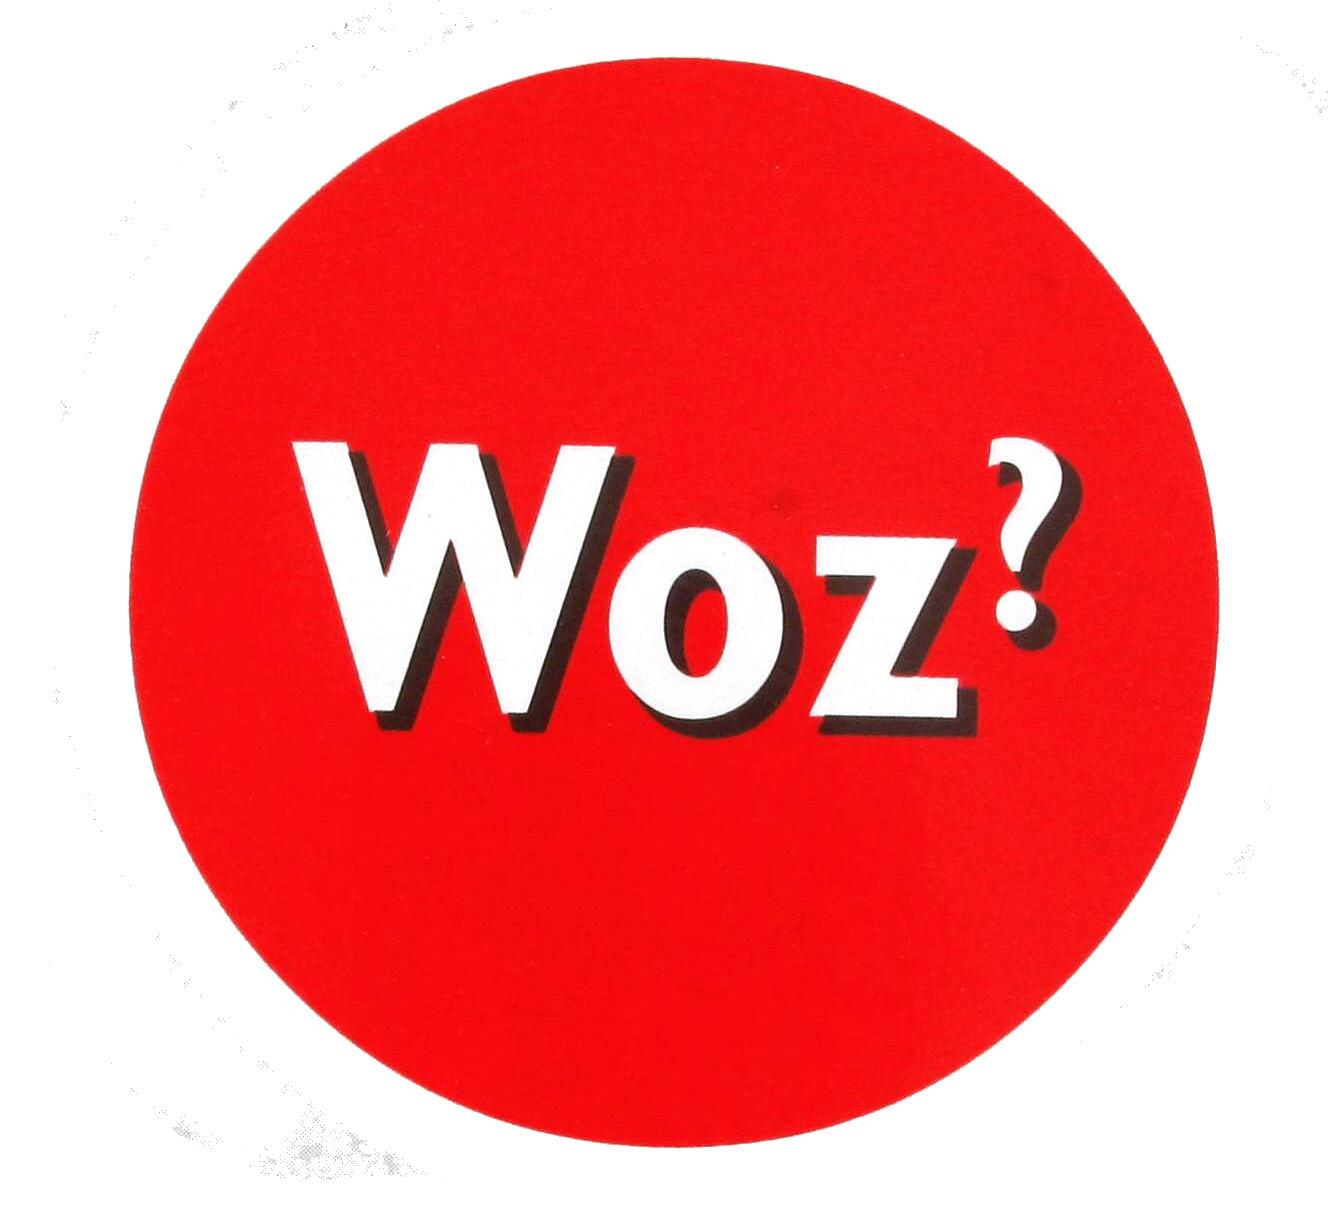 LOGO WOZ ROND copie